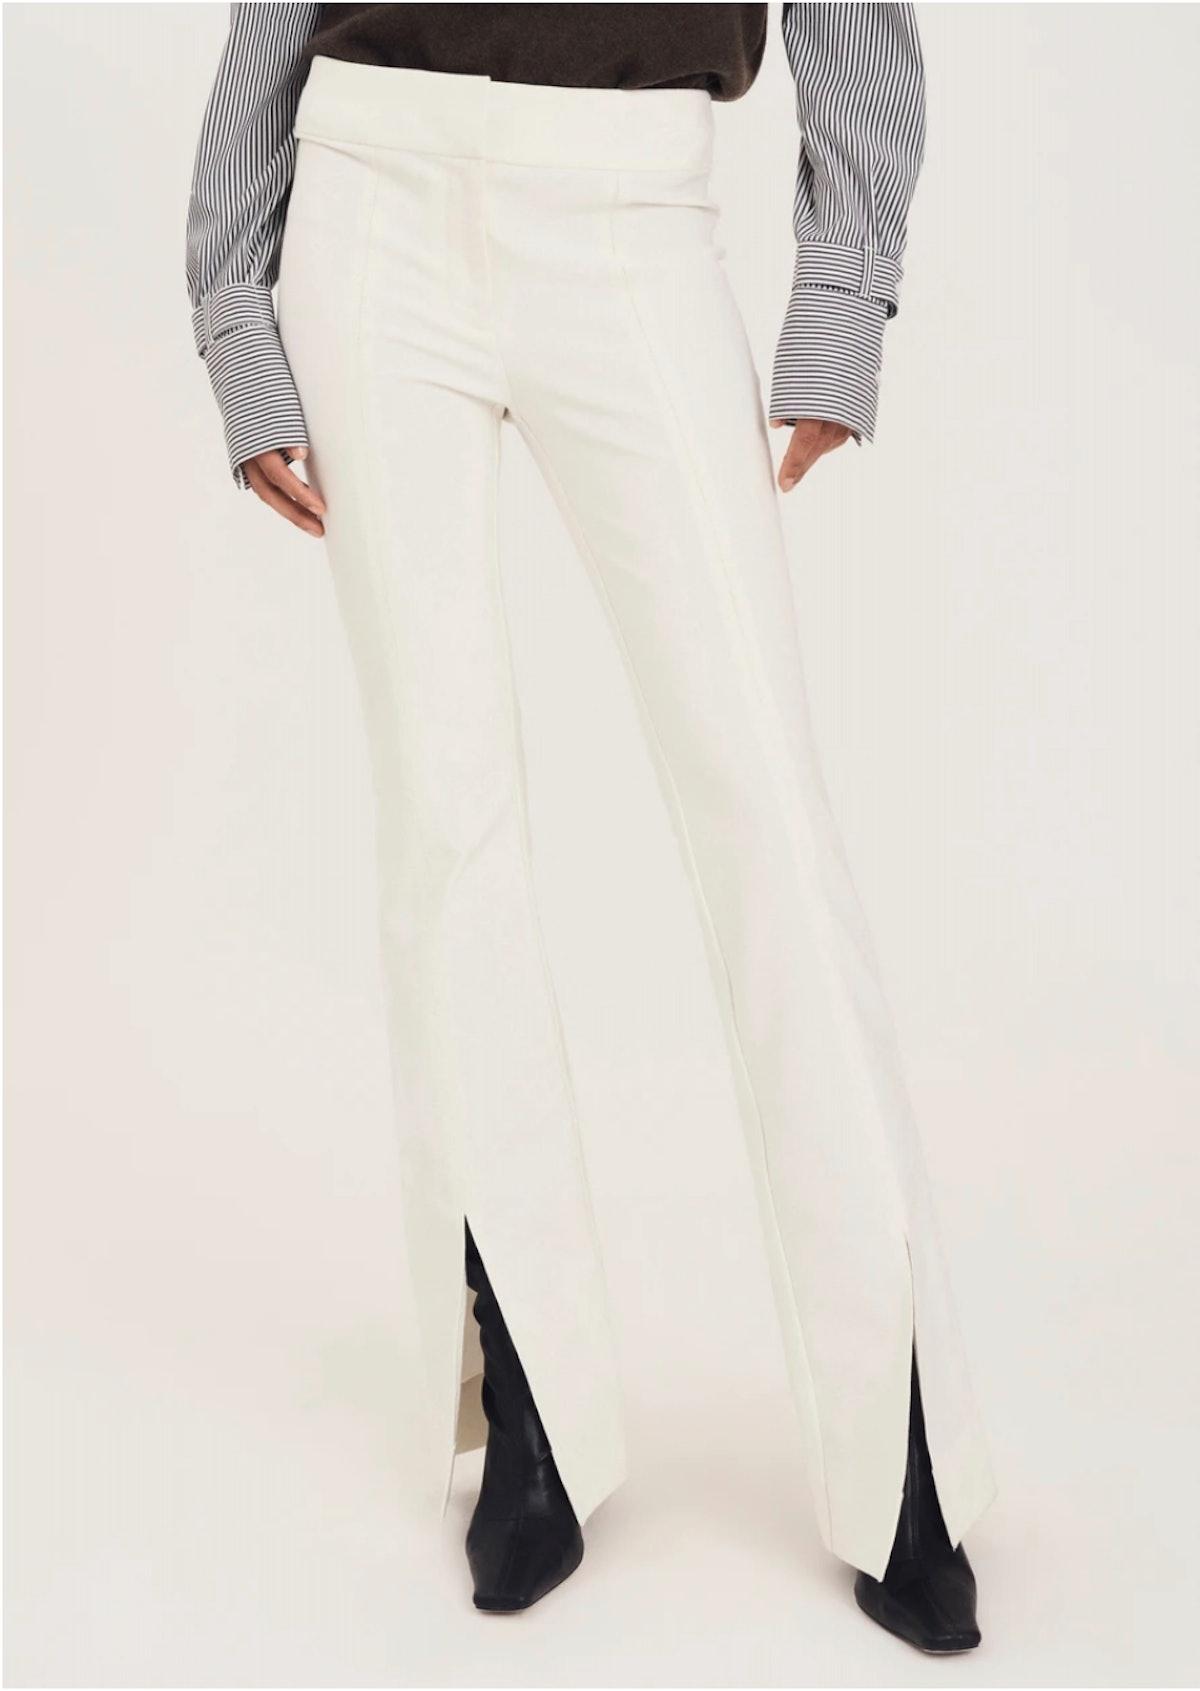 Derek Lam's Maeve Trousers in soft white.